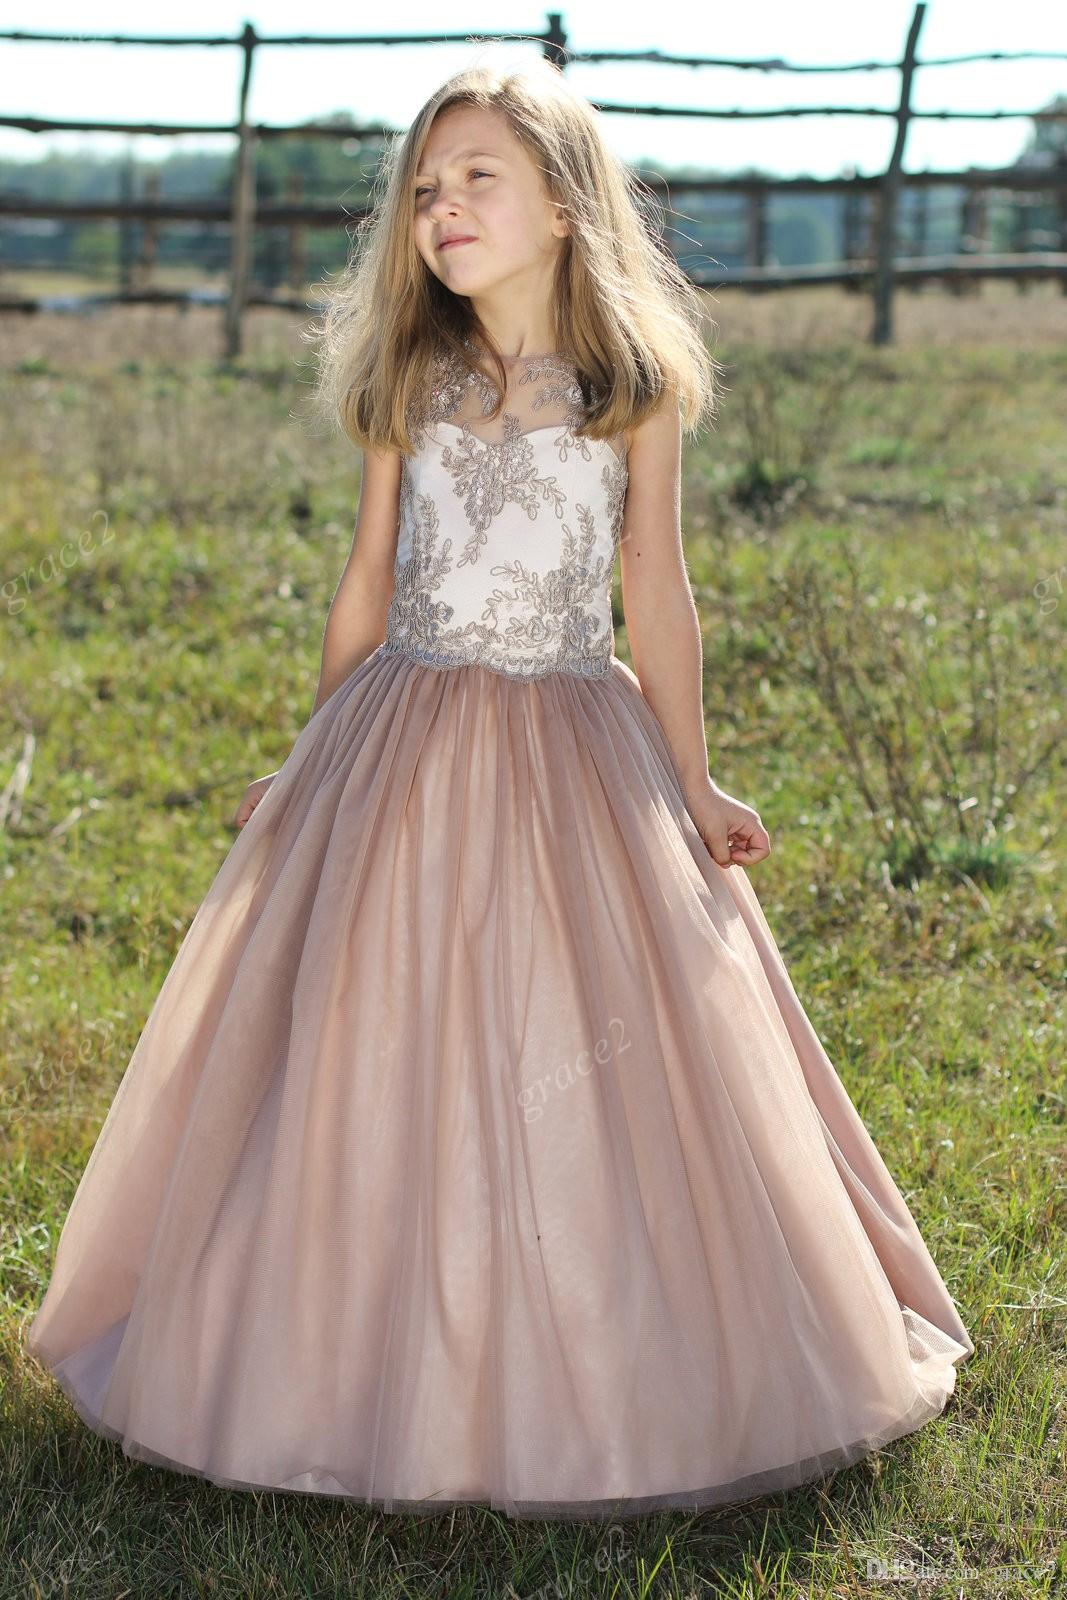 Vestidos de primera comunion para ninas